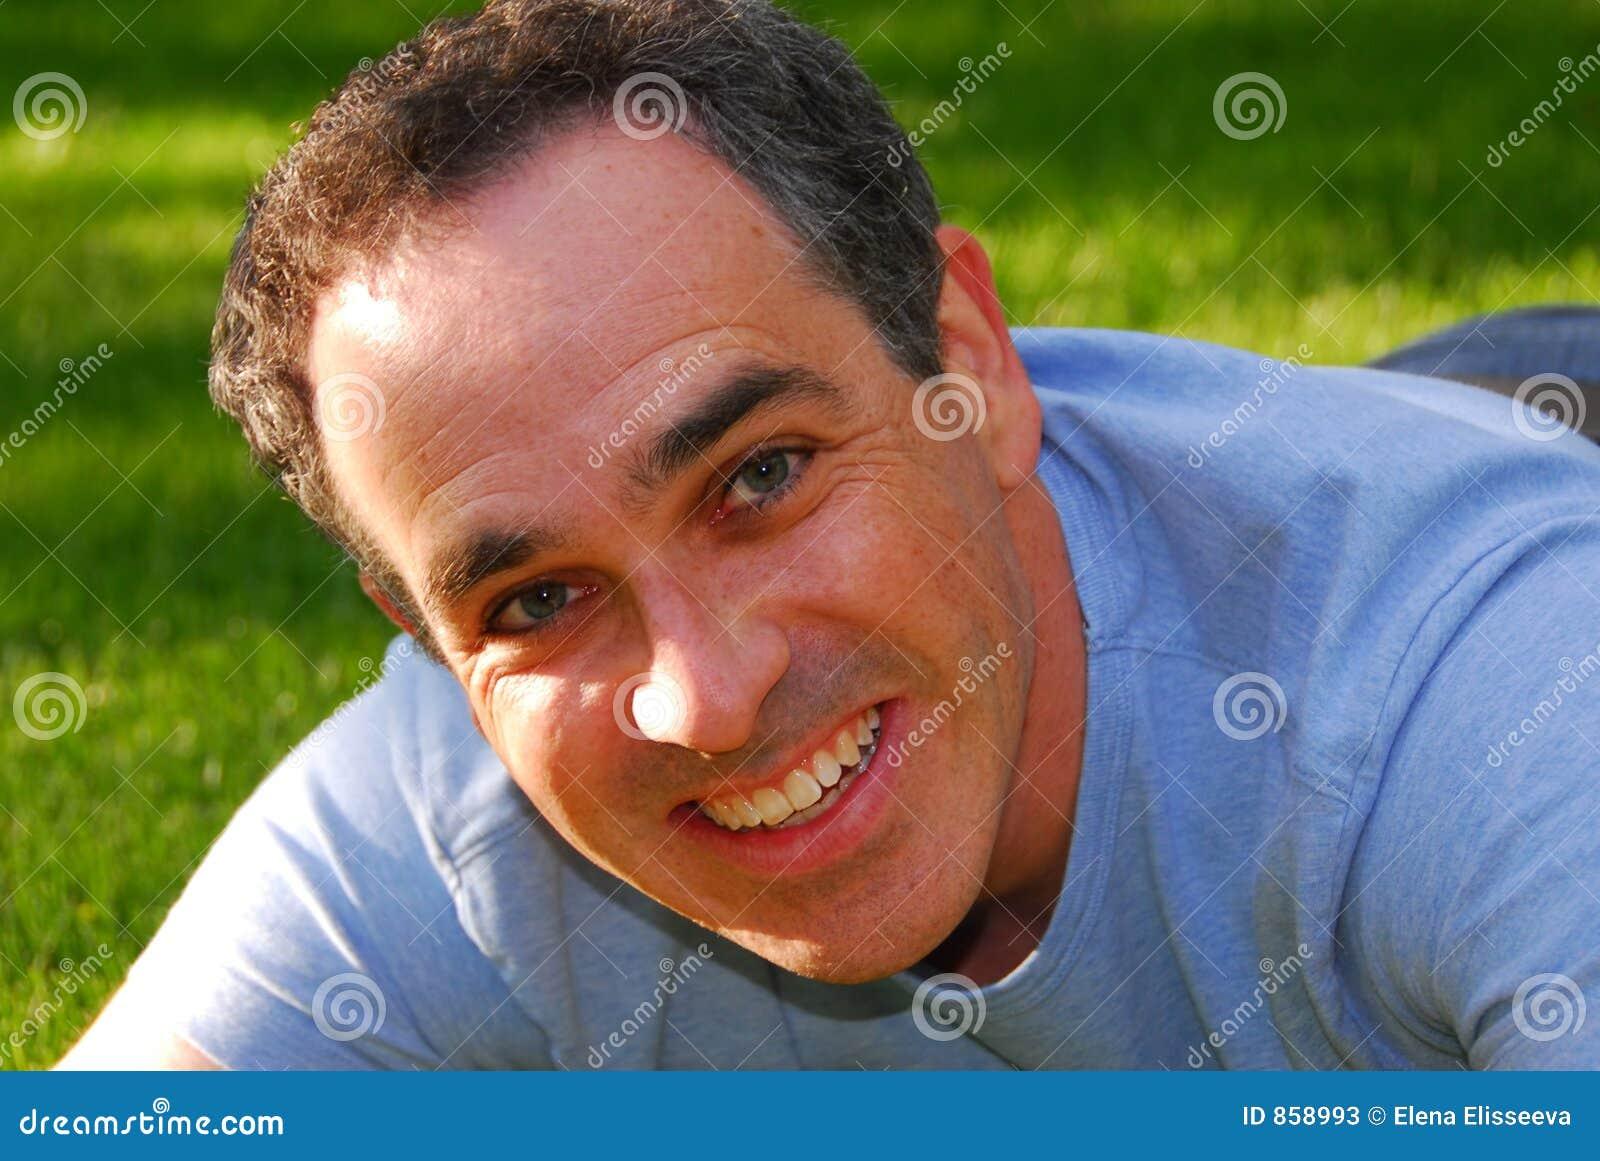 Lachender Mann